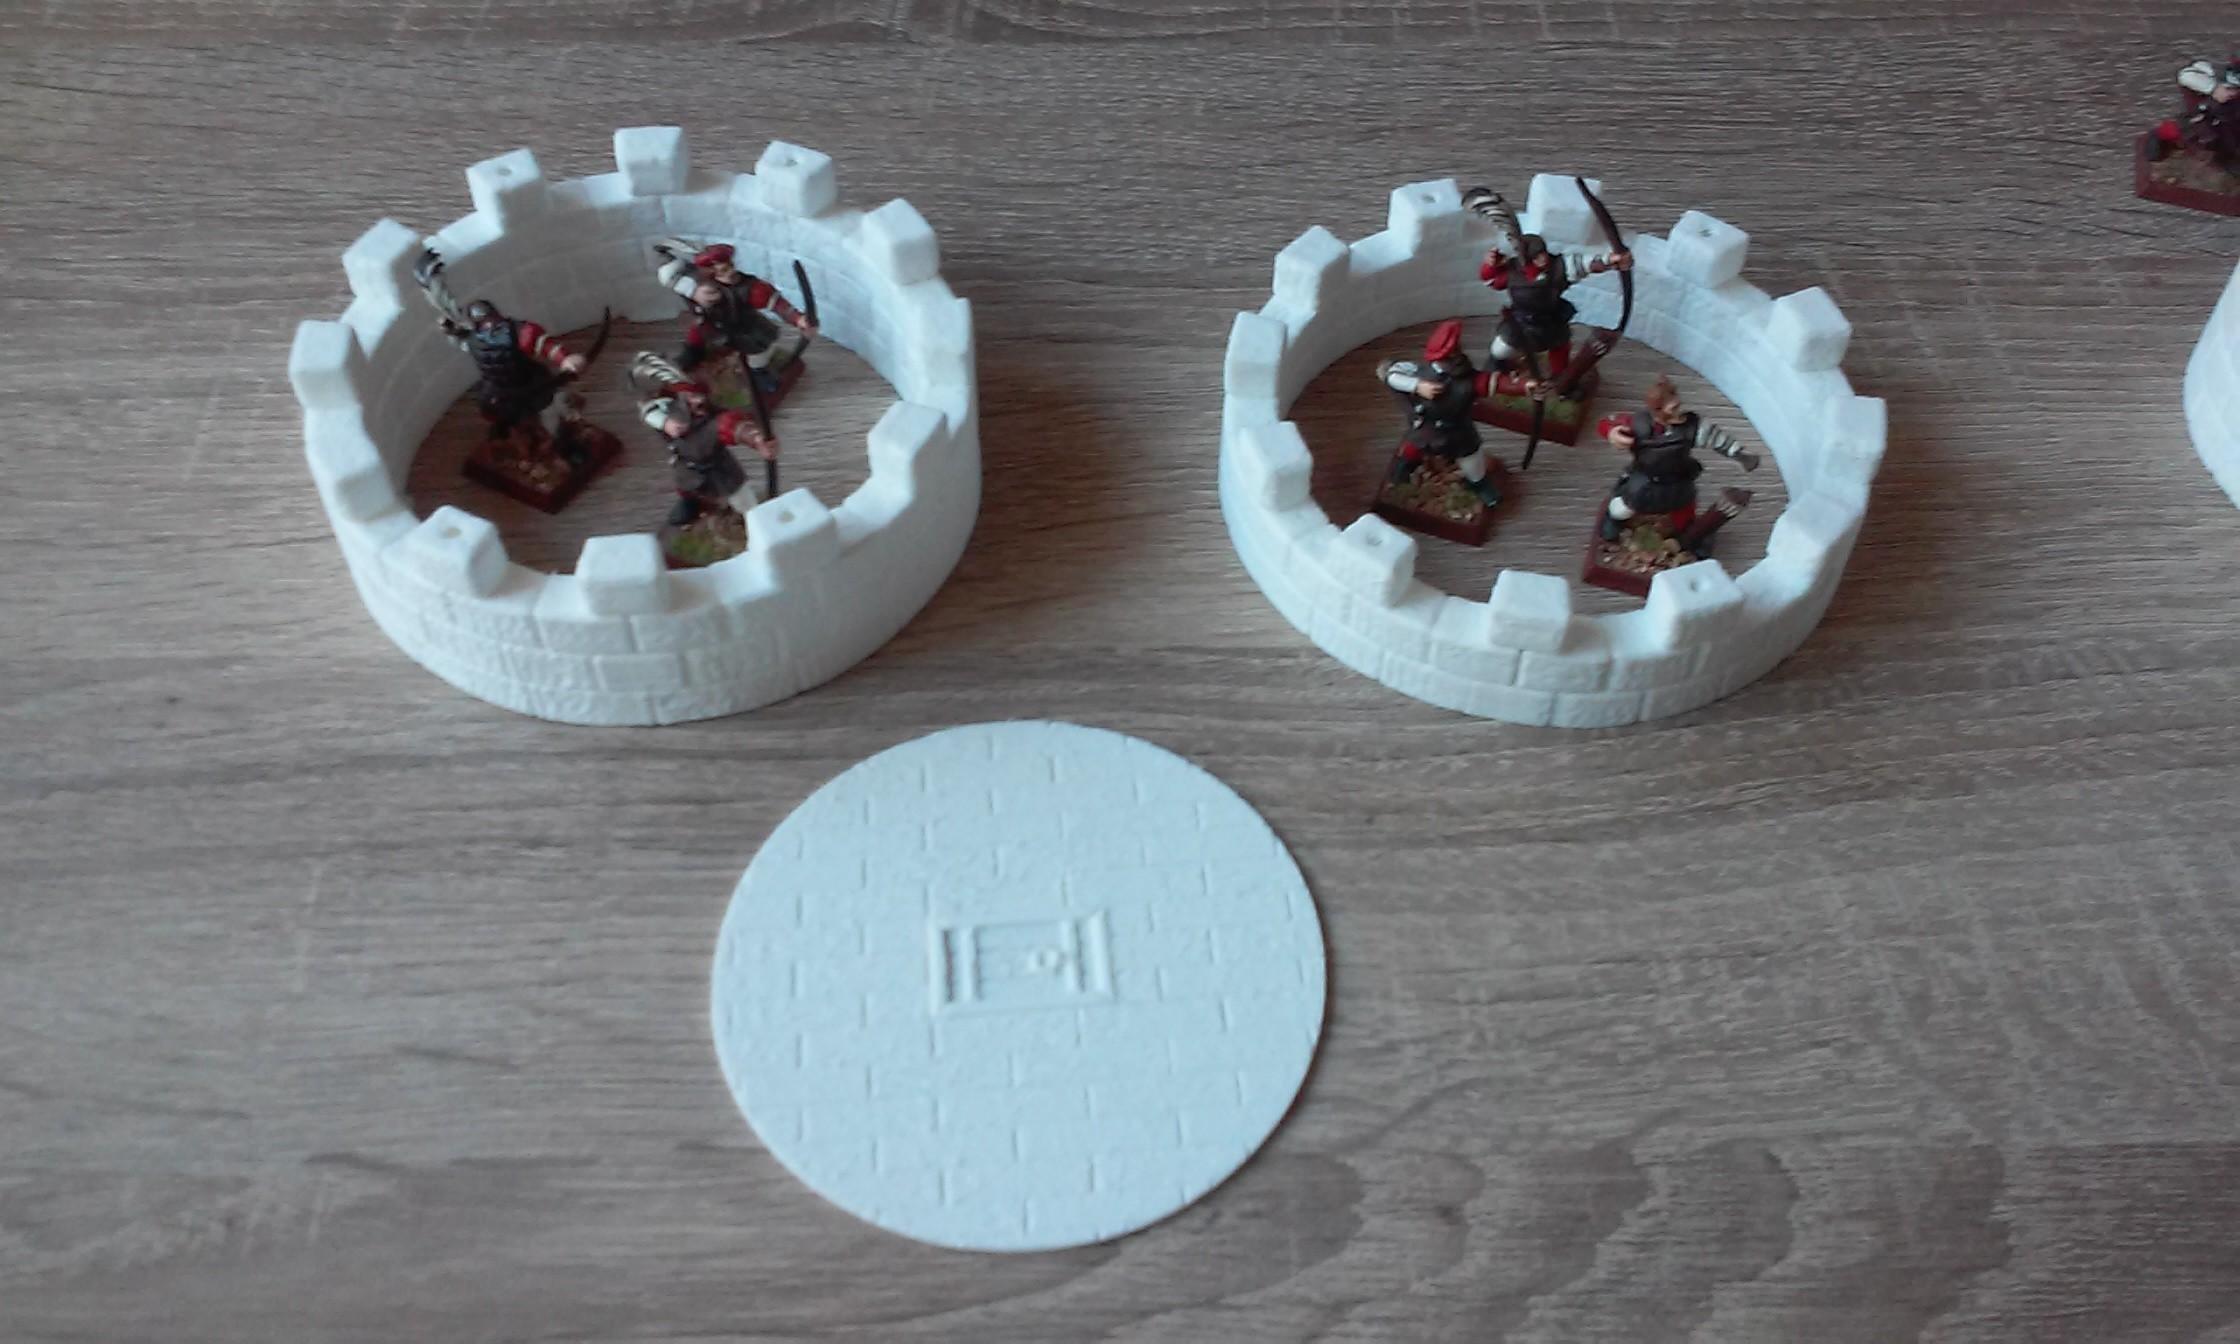 20181009_113023.jpg Download STL file Modular Watchtower - WarGames - Scenary - 3D Printable kit • 3D printable model, SergioGE